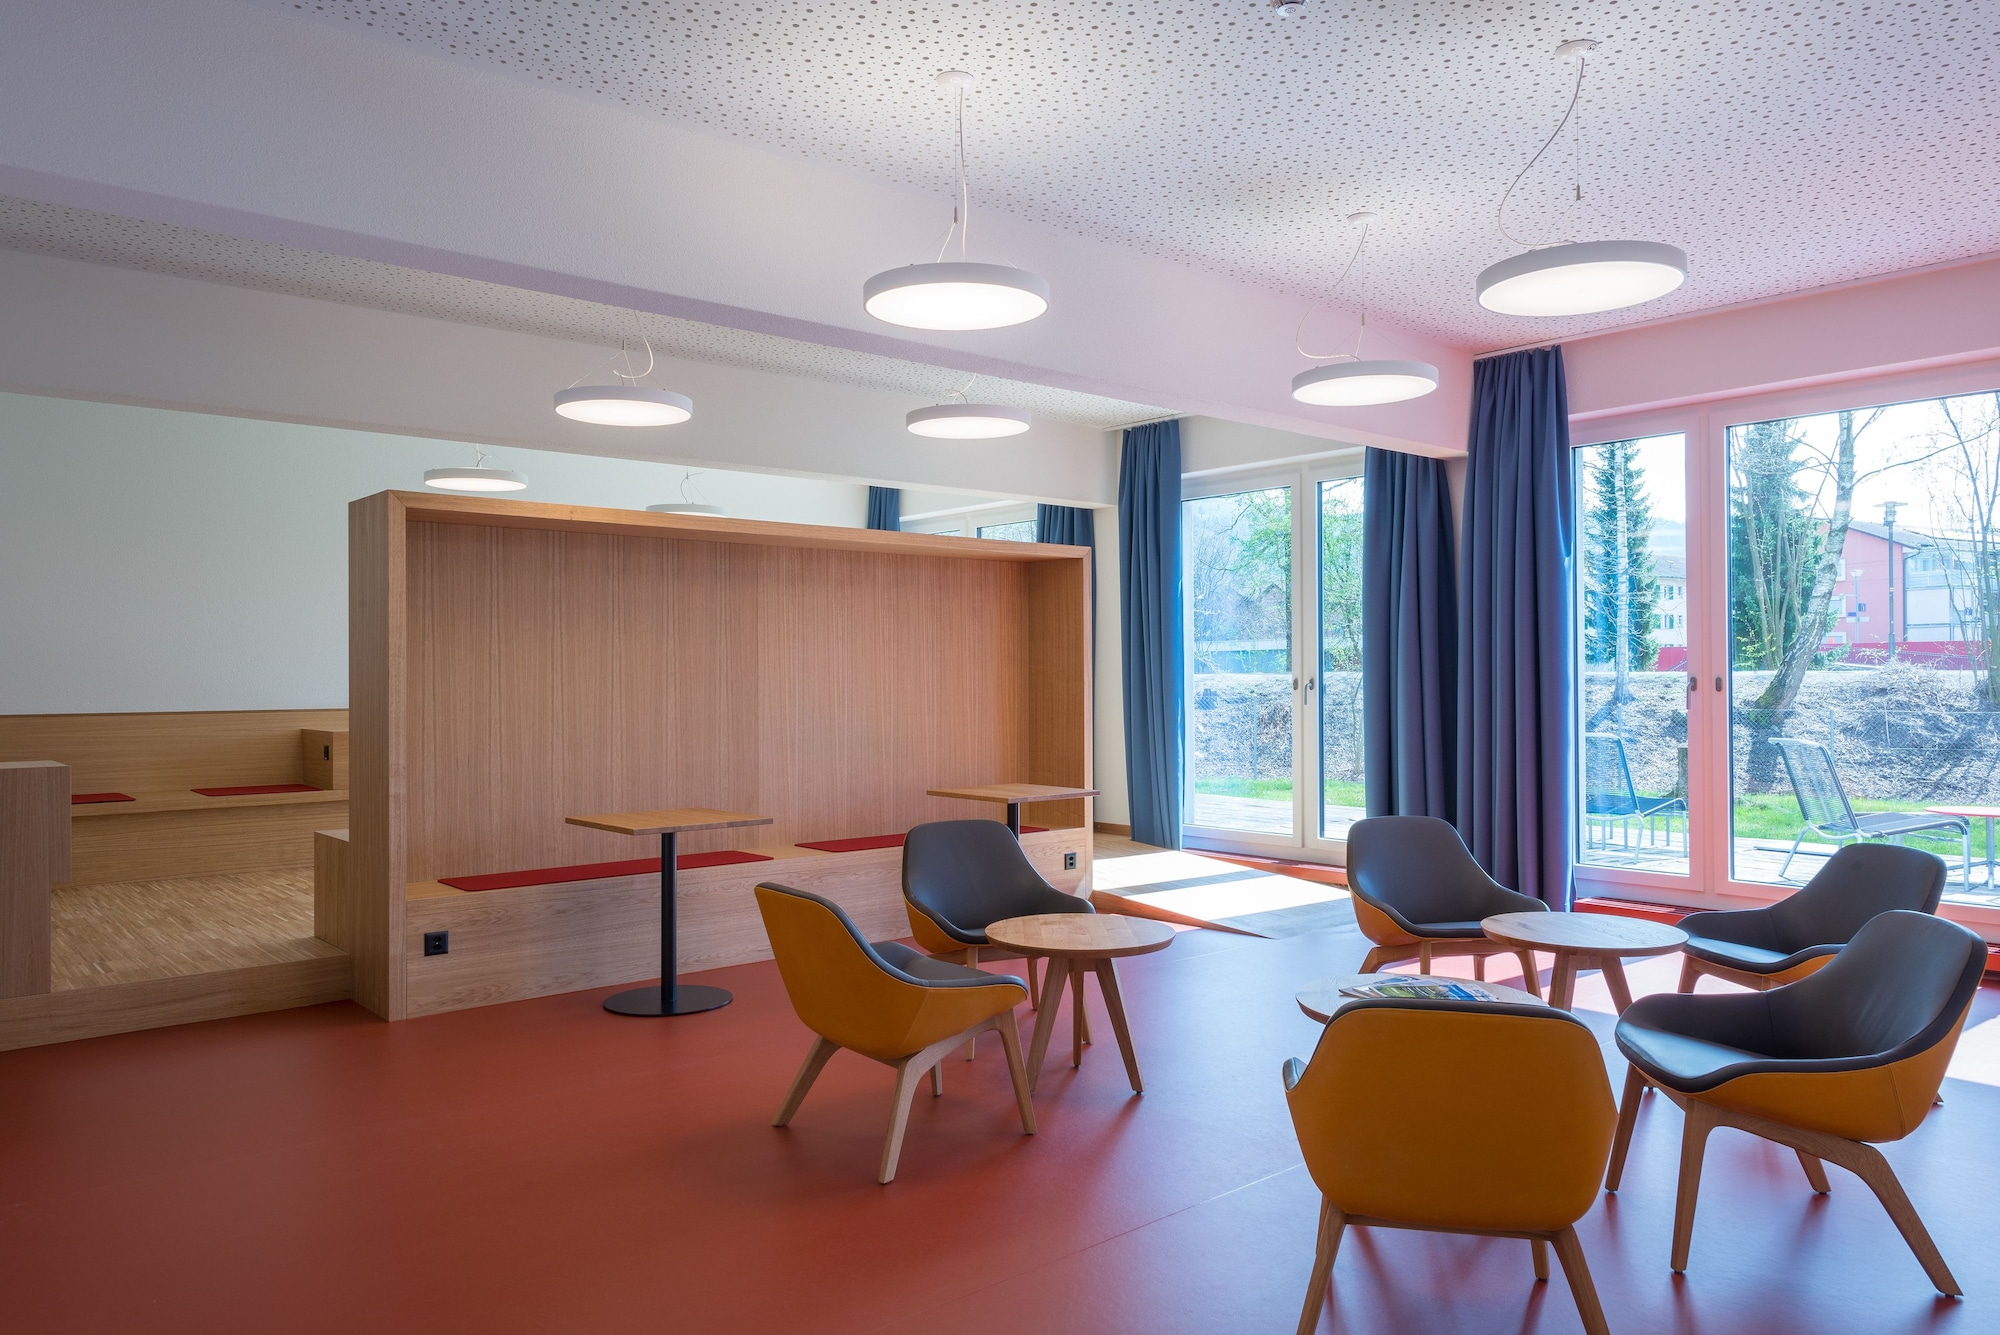 Youth Hostel Zug, Zug